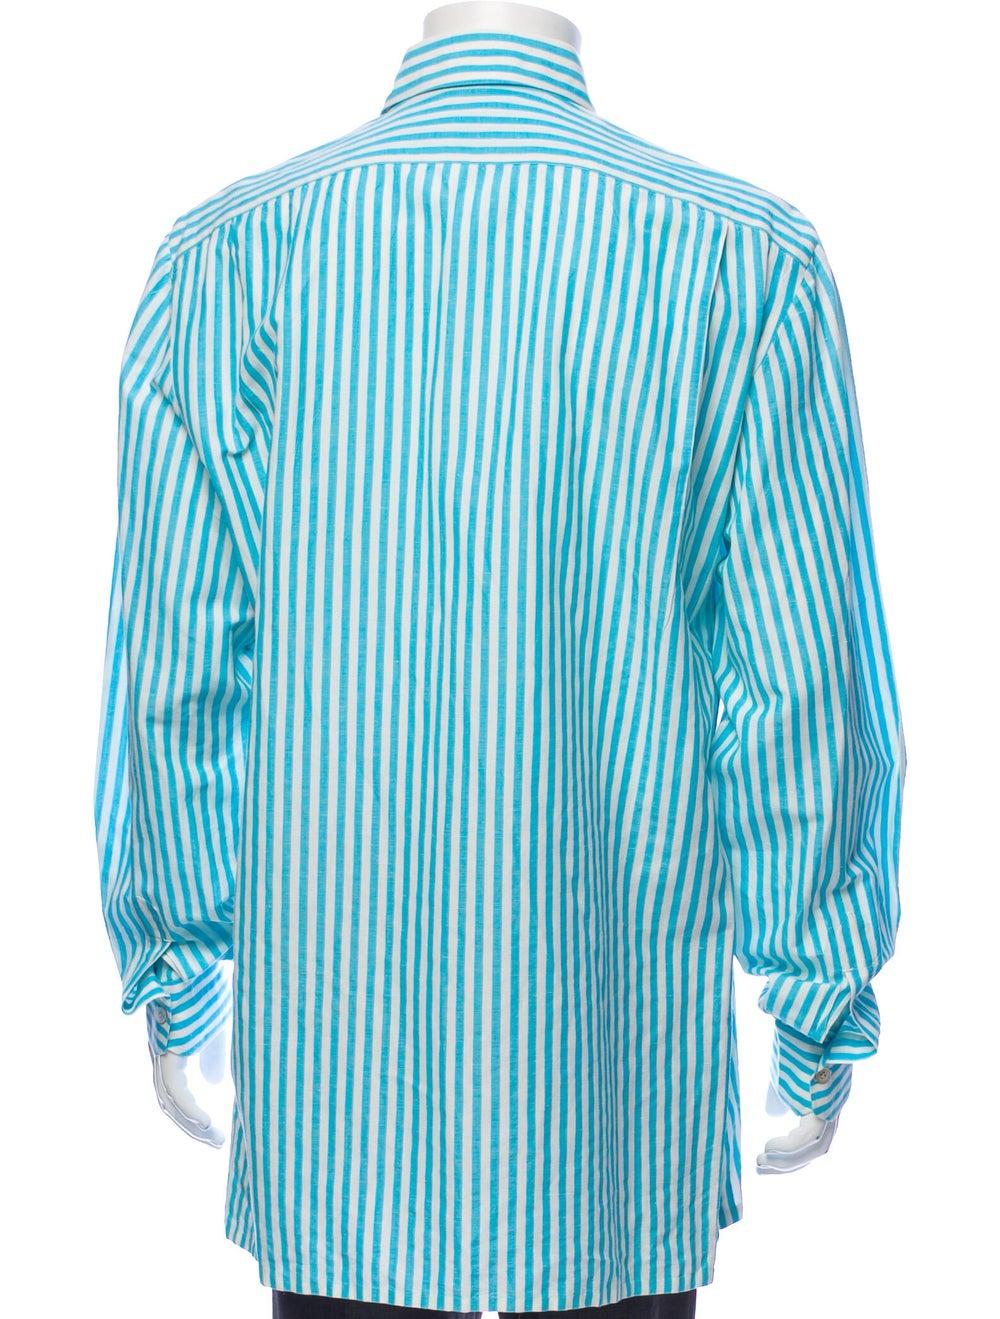 Kiton Linen Striped Shirt Blue - image 3